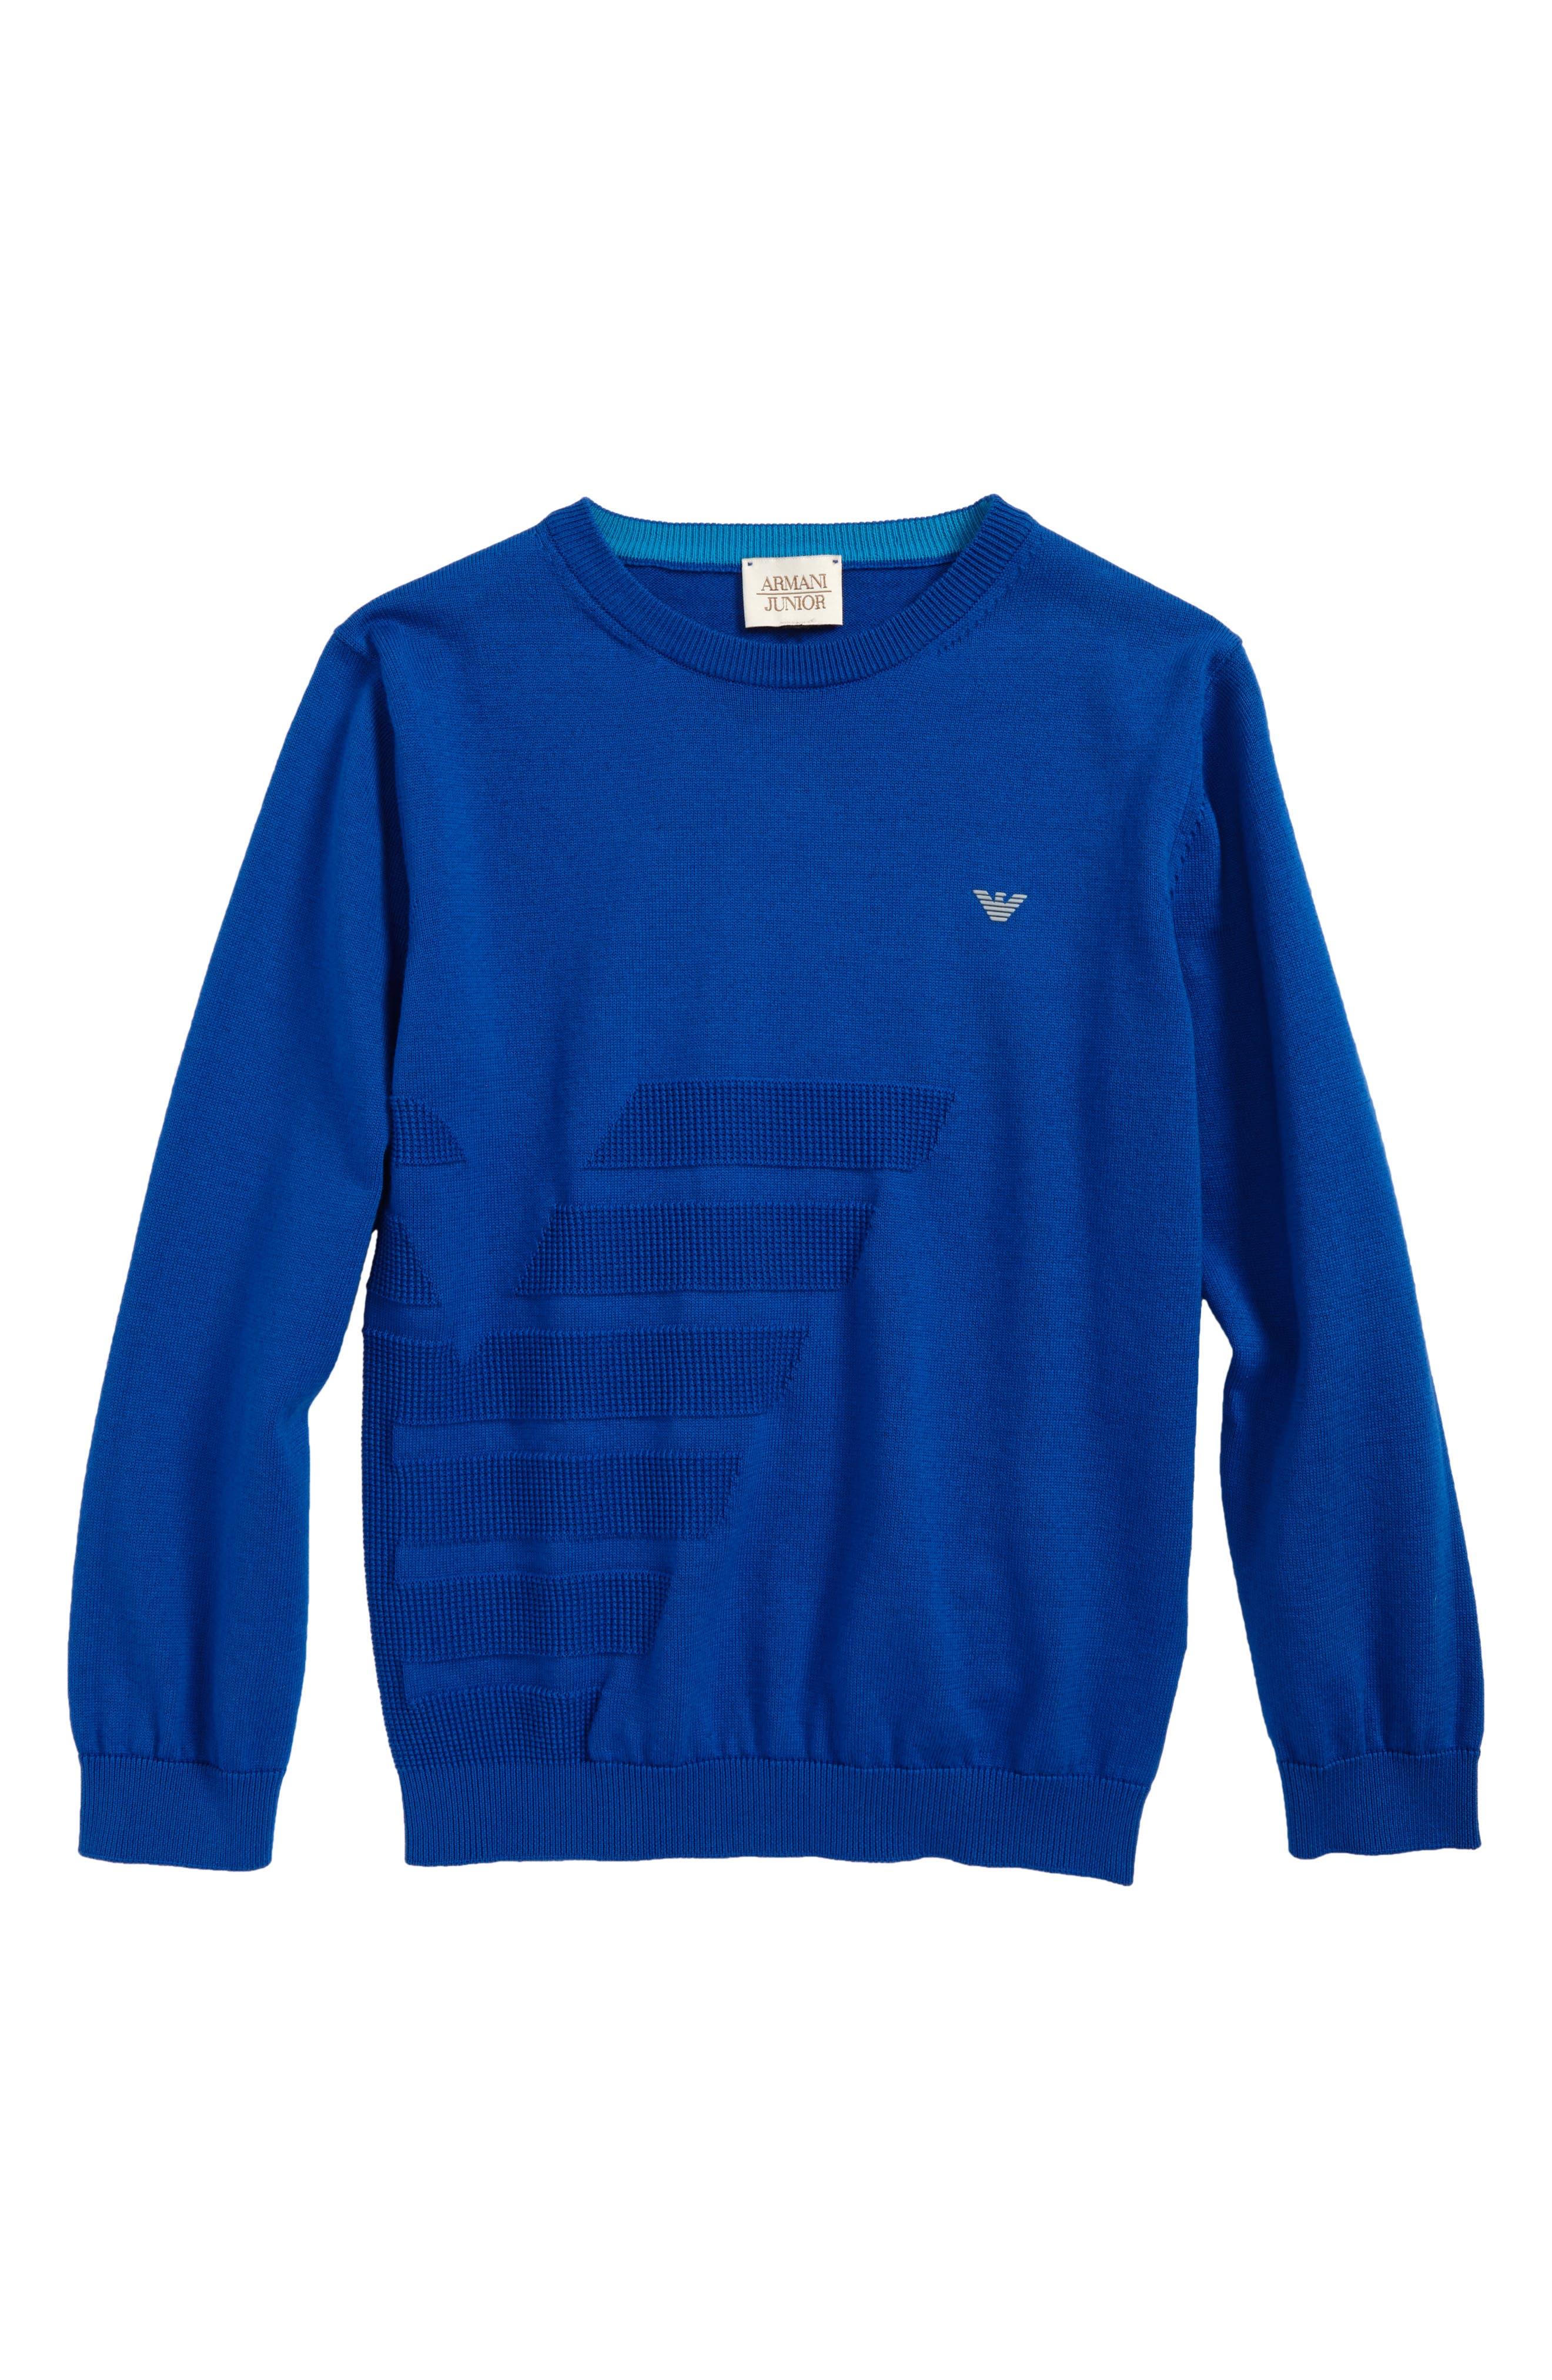 Logo Sweater,                             Main thumbnail 1, color,                             Royal Blue